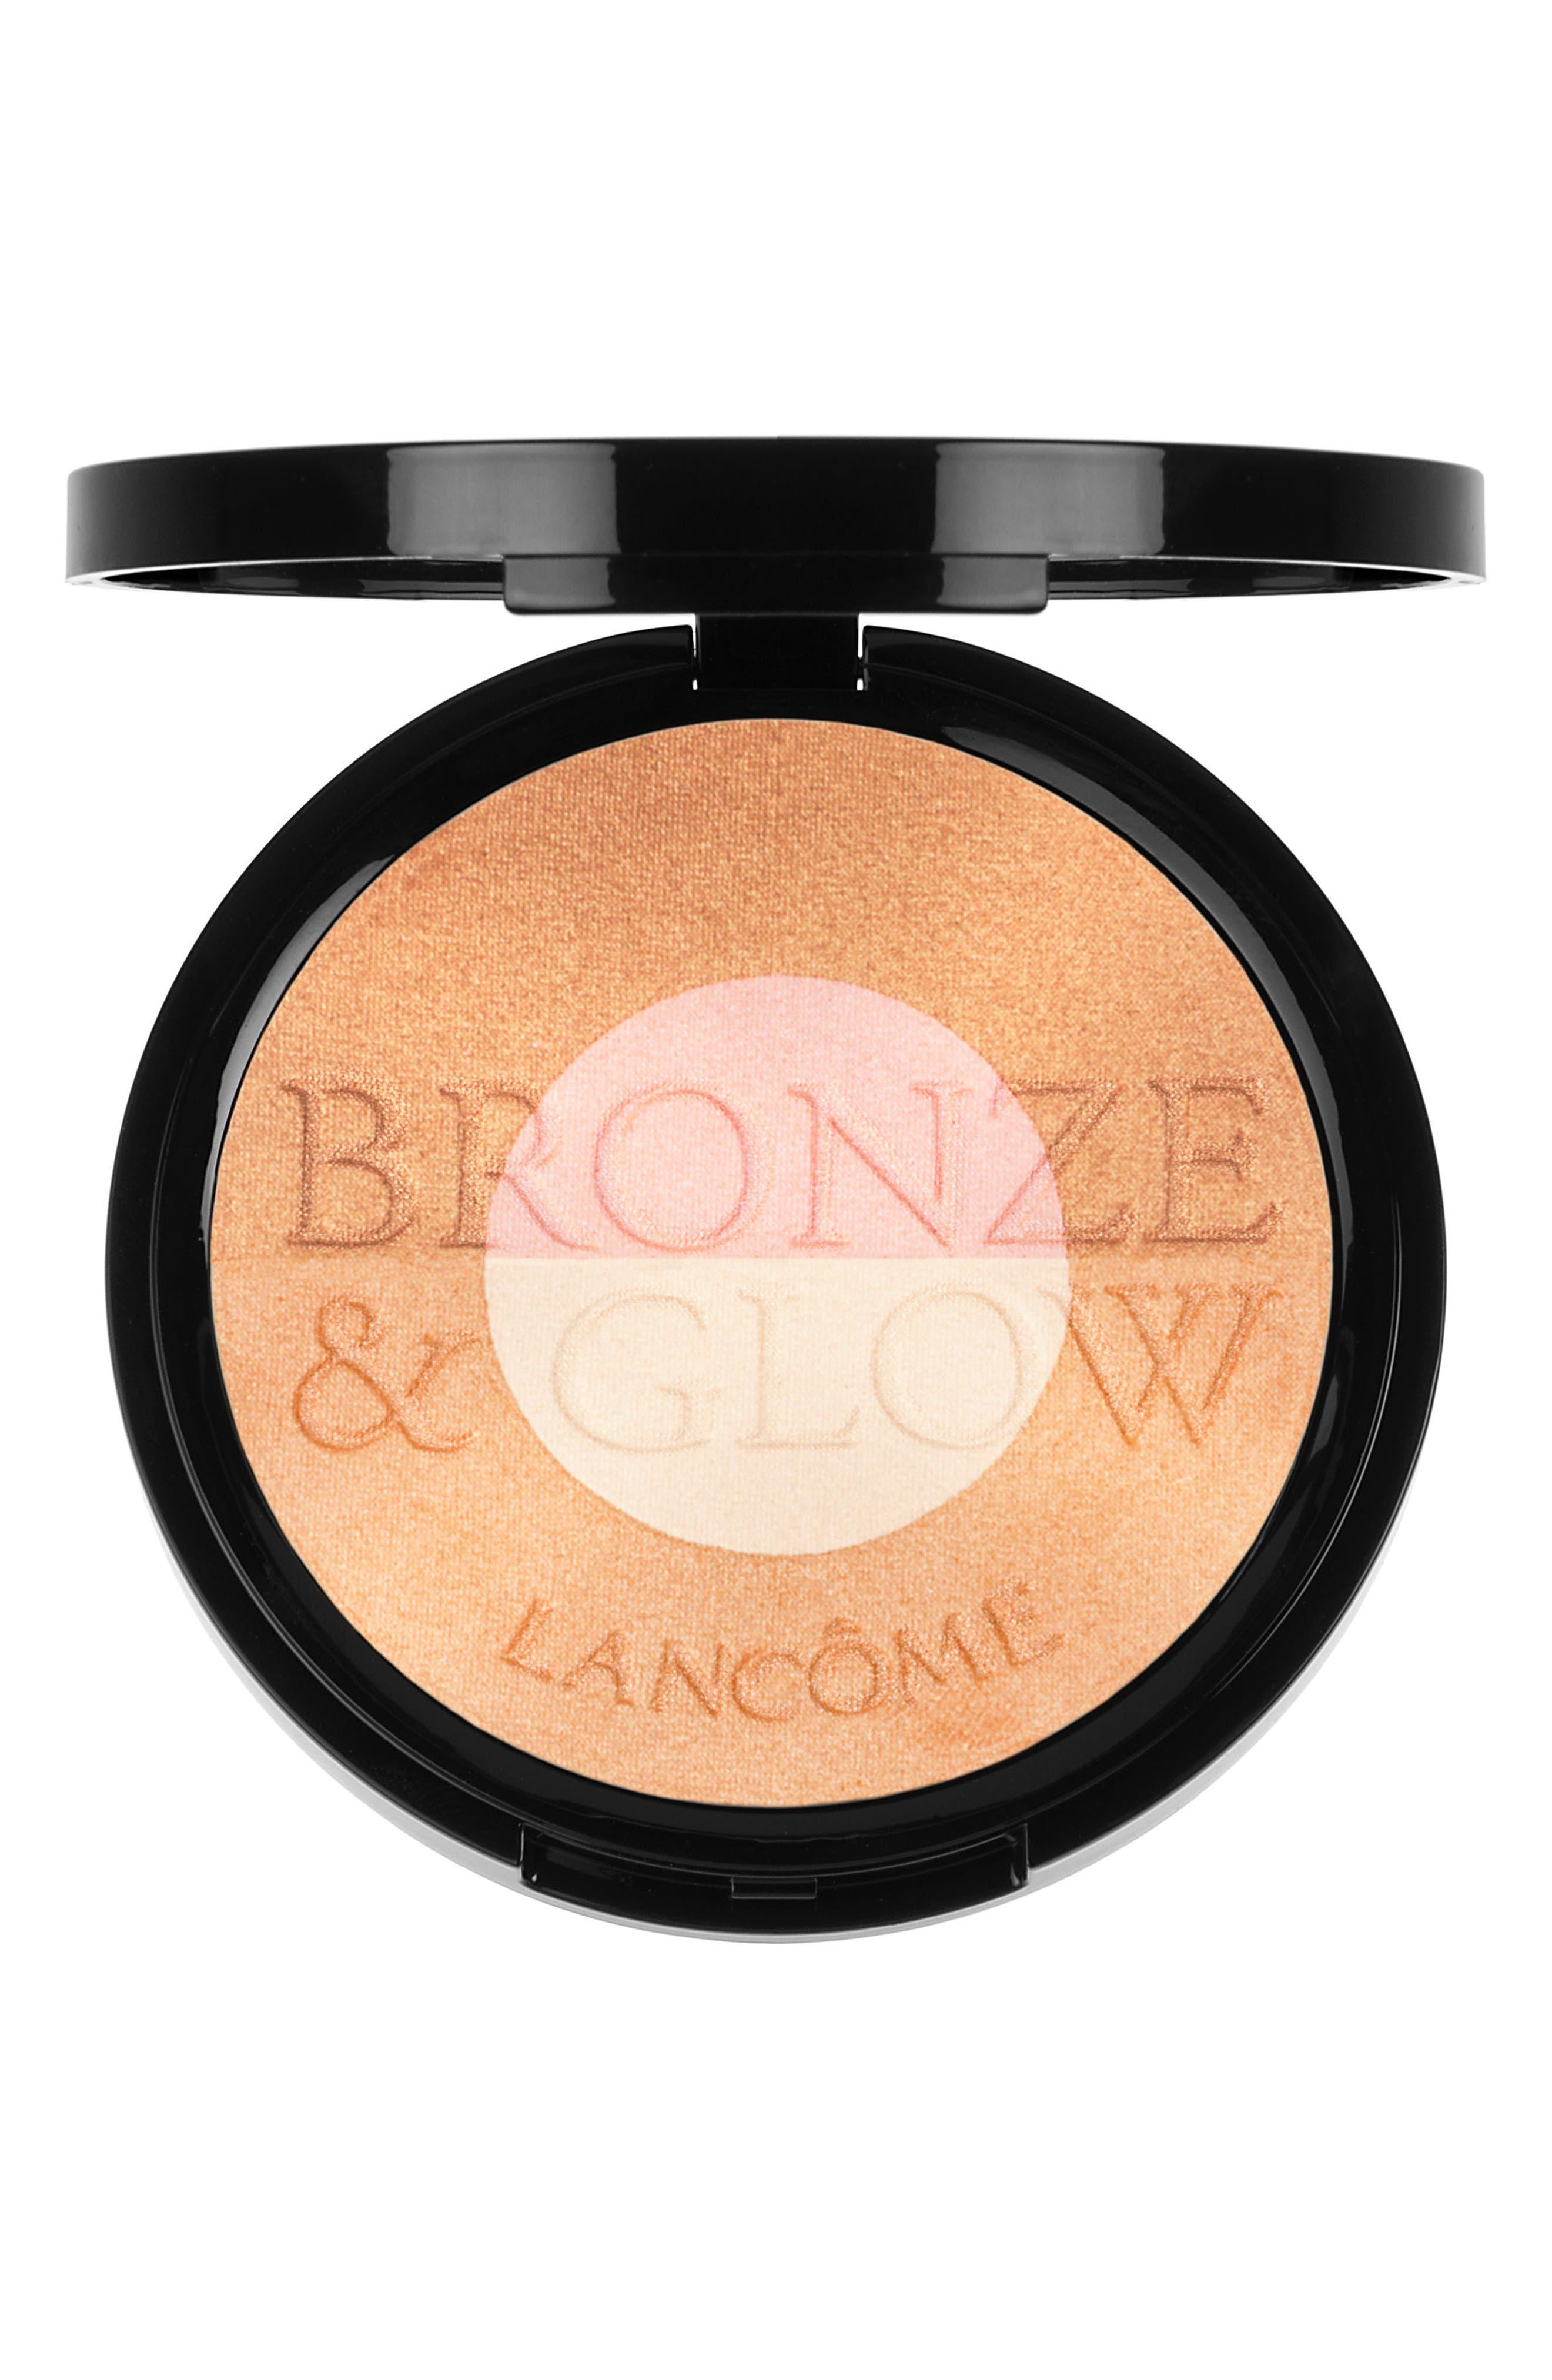 Bronze & Glow Powder,                             Main thumbnail 1, color,                             Time To Glow